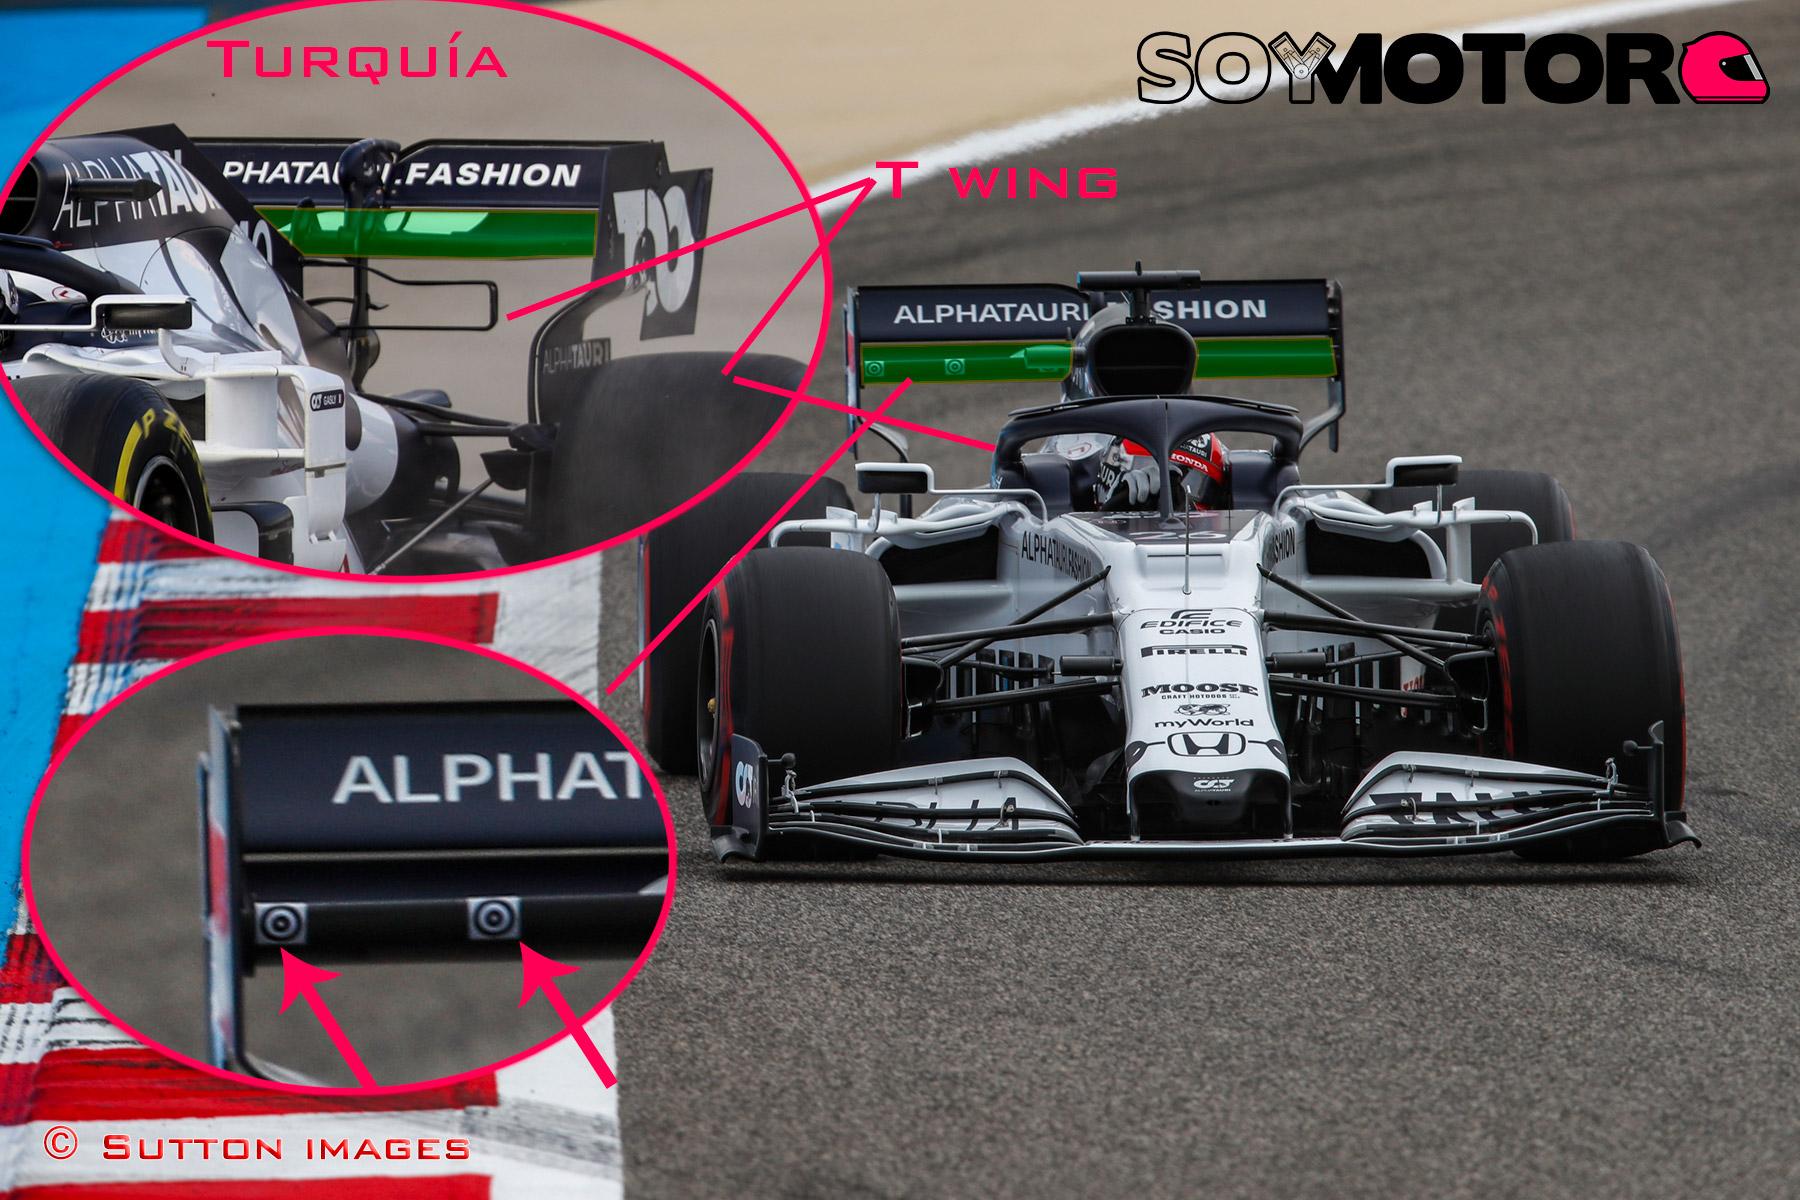 alhpa-tauri-ala-trasera-y-t-wing-soymotor.jpg